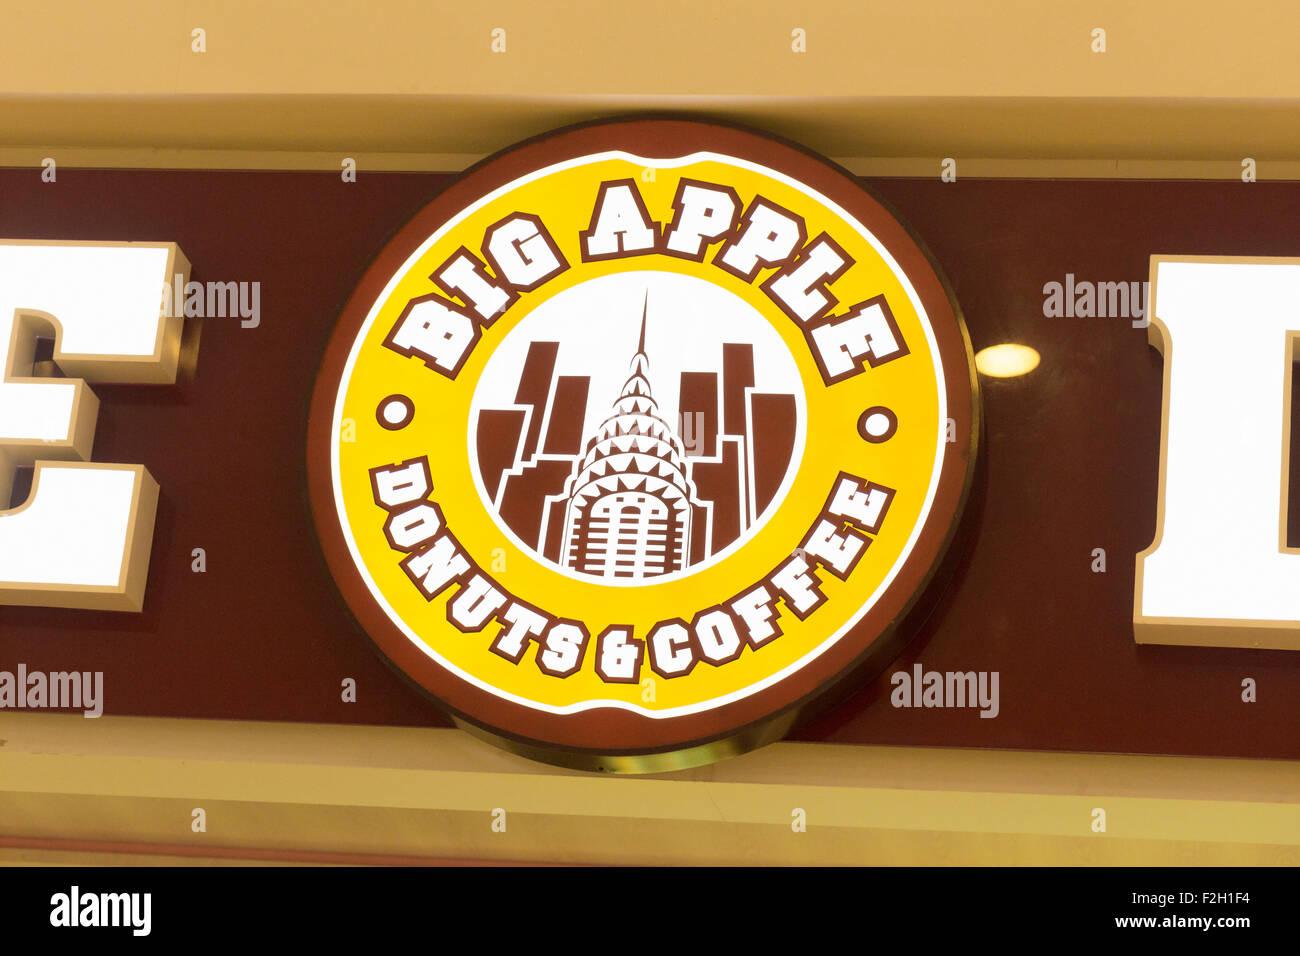 Big Apple donuts & logo café Photo Stock